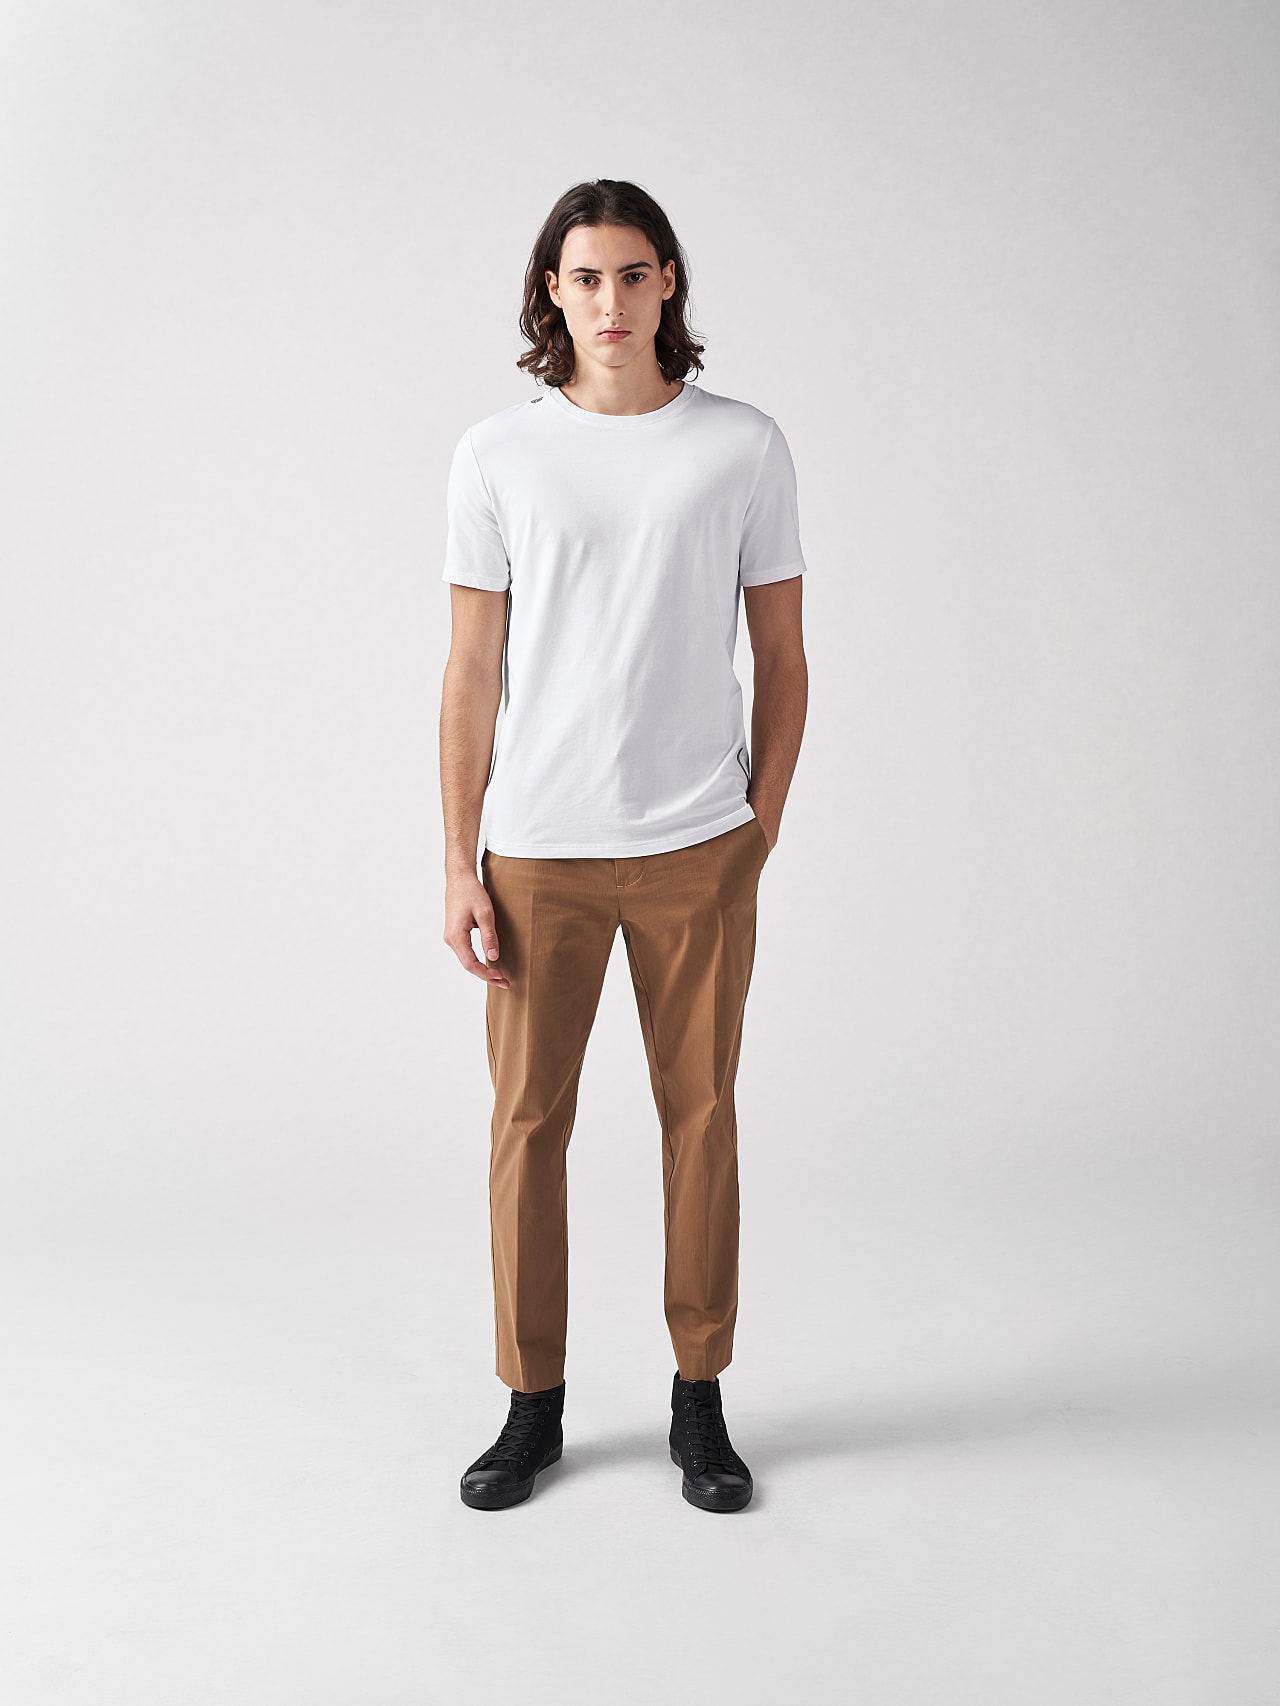 JALIP V1.Y5.01 Cotton Crew-Neck T-Shirt white Front Alpha Tauri